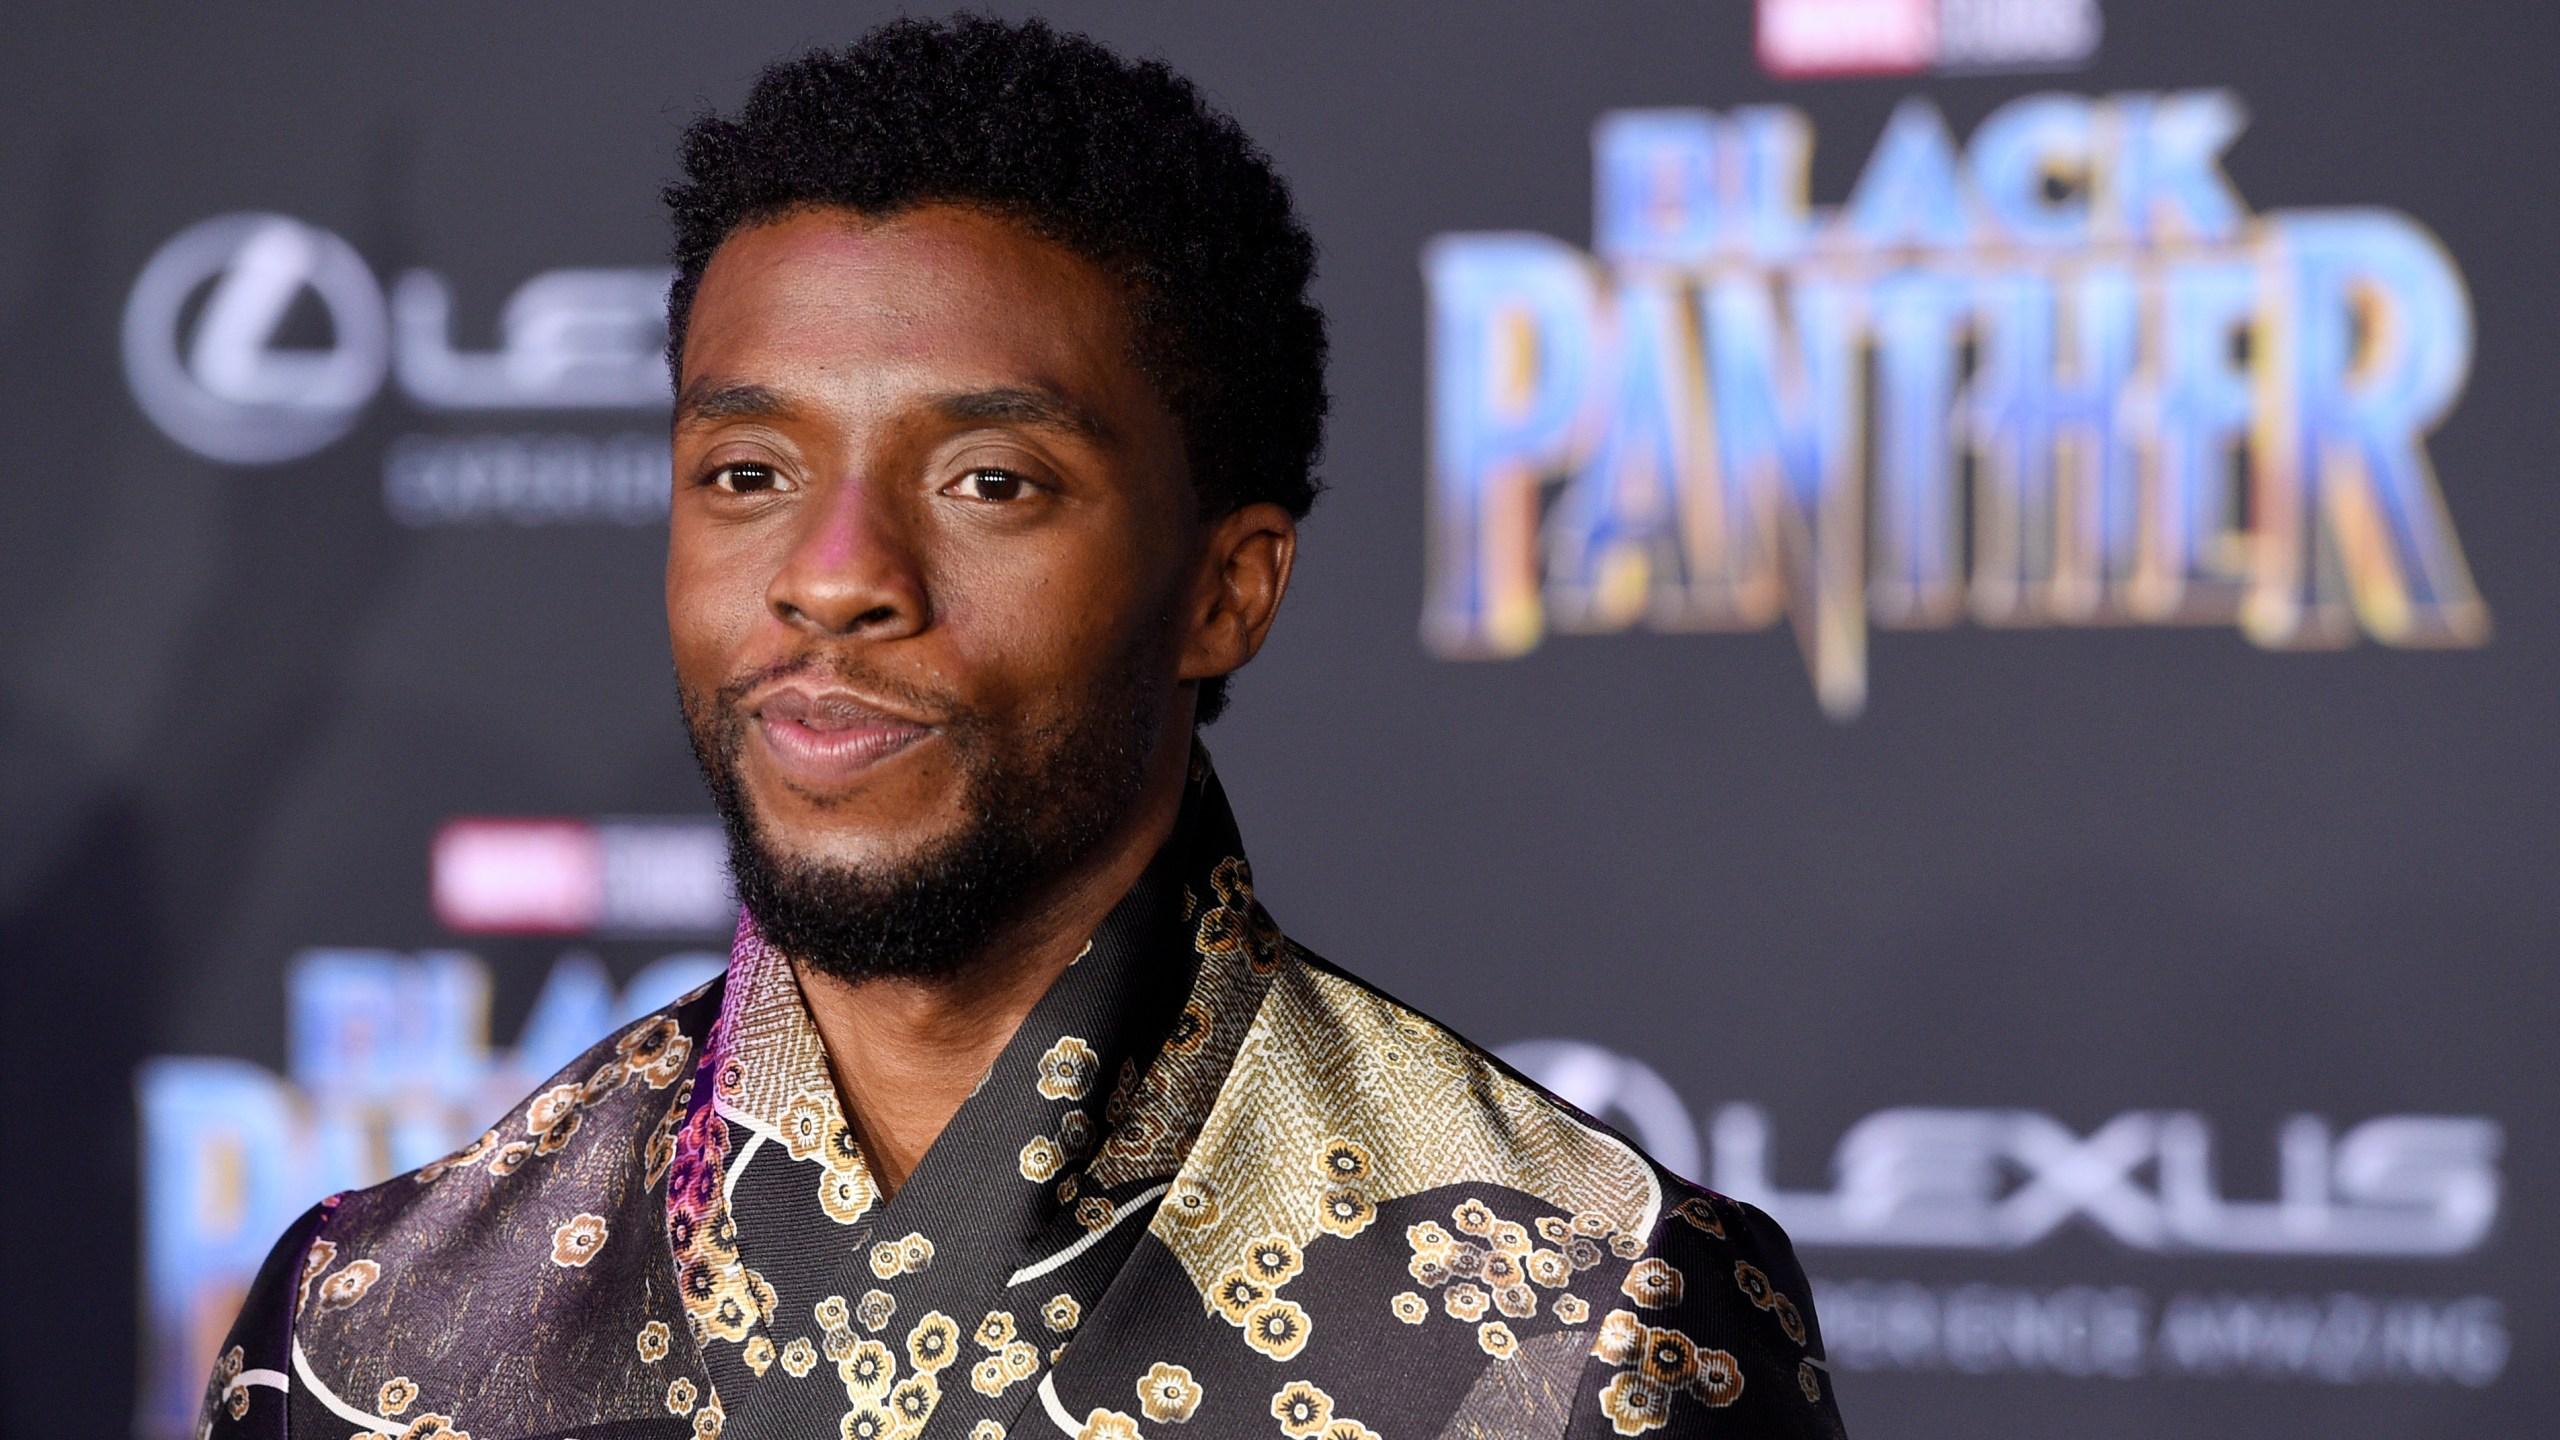 LA_Premiere_of__Black_Panther__28196-159532.jpg92516592